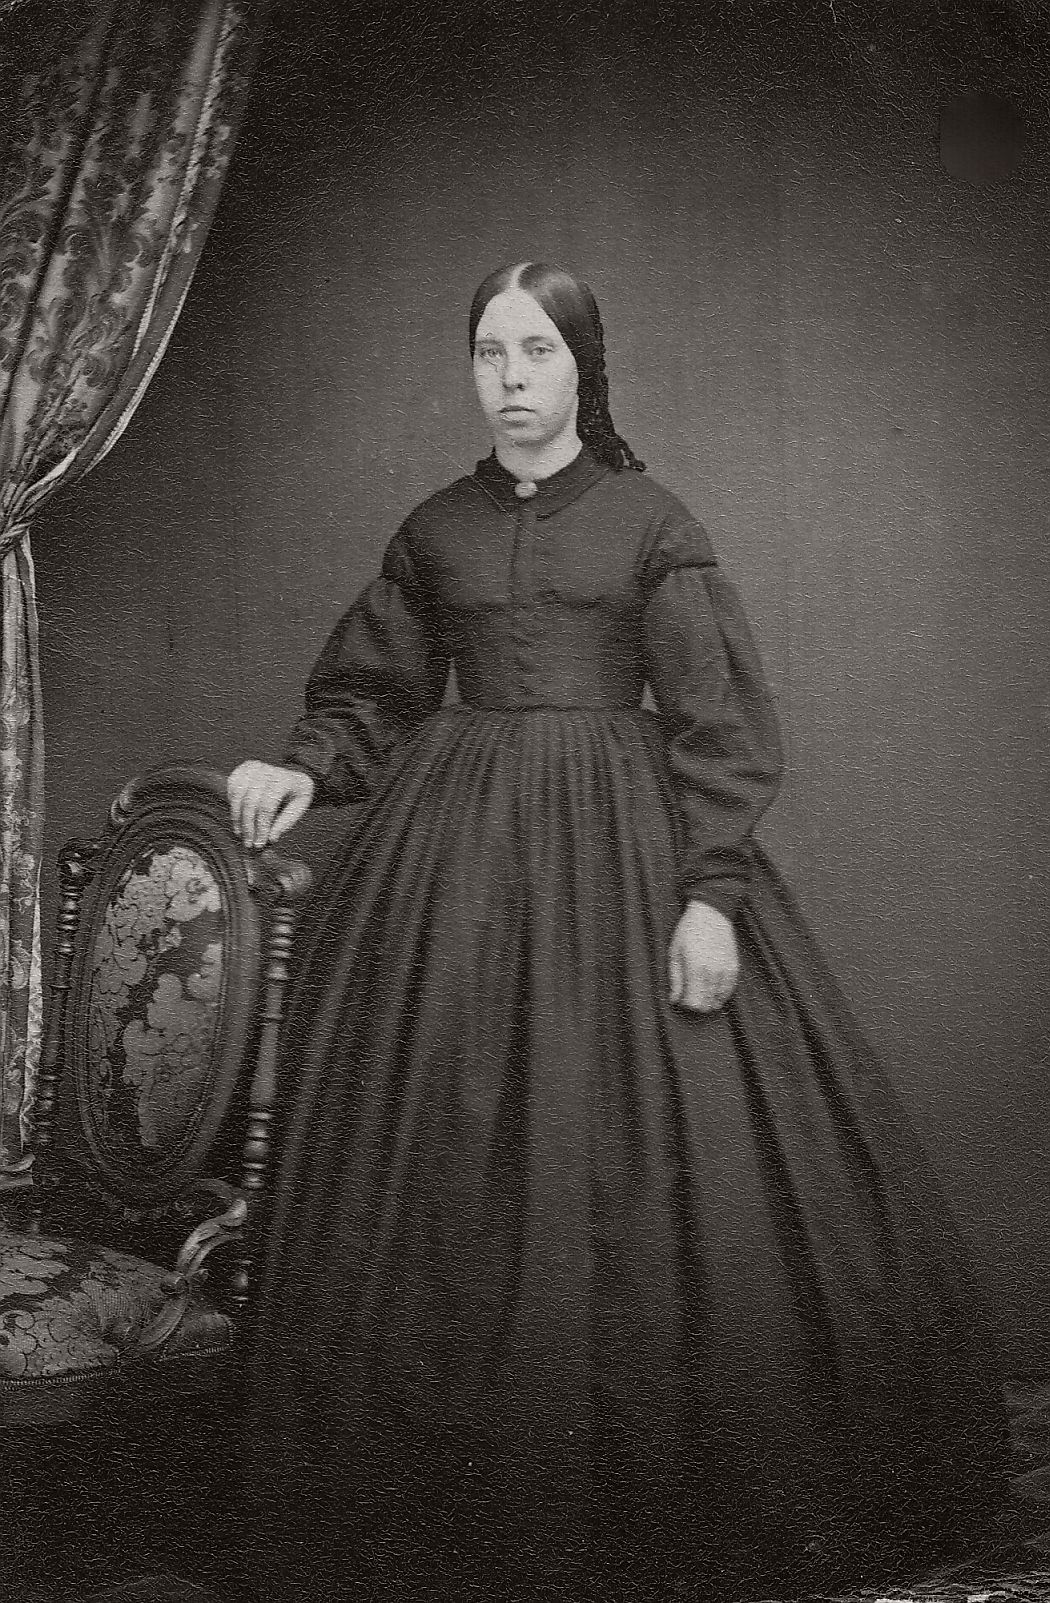 vintage-daguerreotypes-of-widows-in-mourning-victorian-era-1800s-33